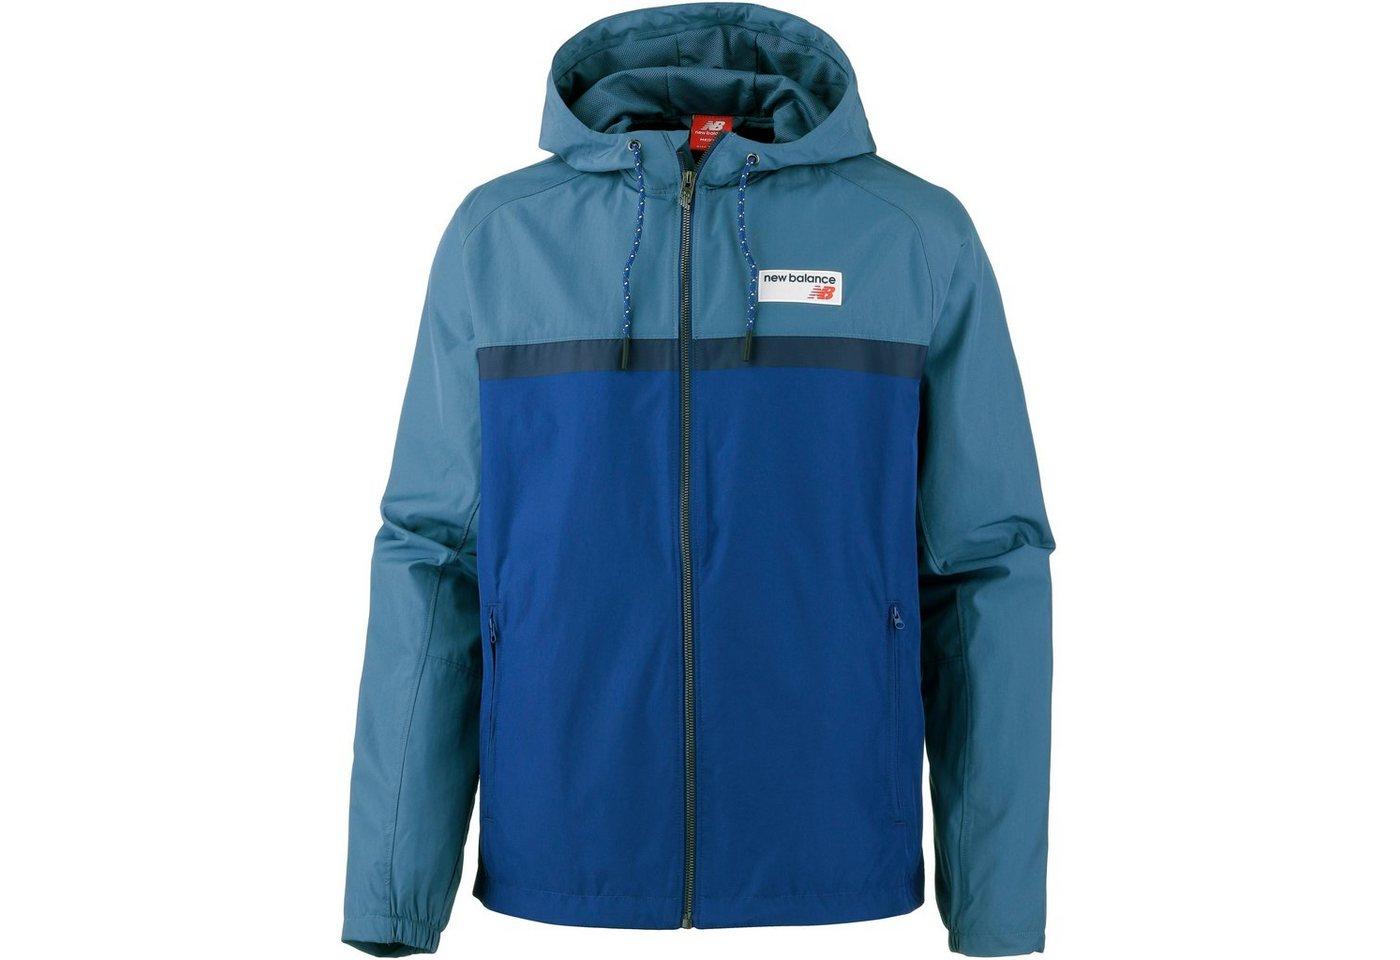 New Balance Windbreaker   Sportbekleidung > Sportjacken > Windbreaker   Blau   Polyester   New Balance